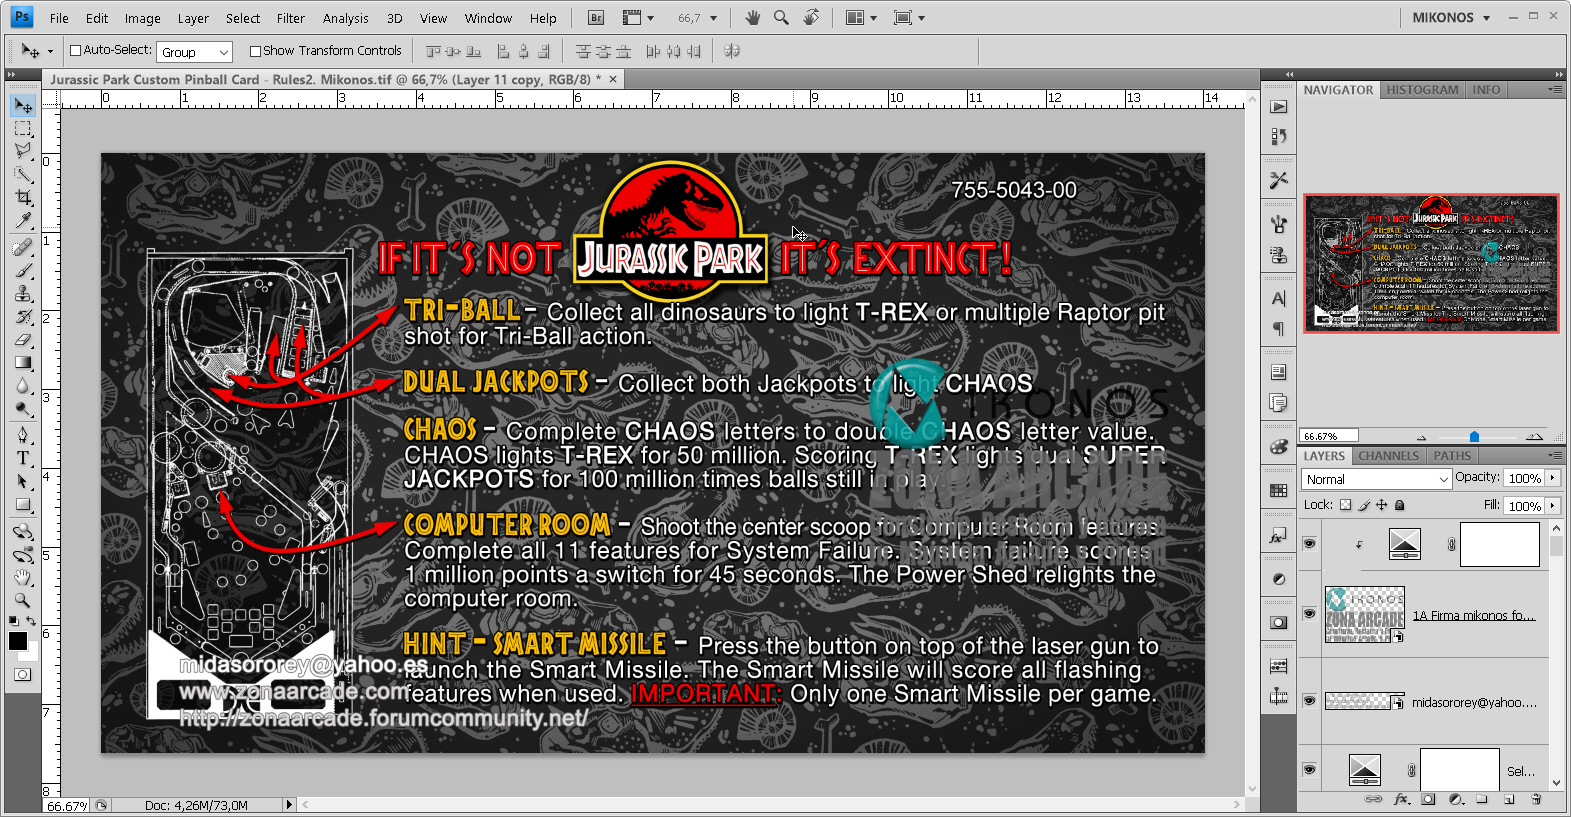 Jurassic%20Park%20Custom%20Pinball%20Card%20-%20Rules.%20Mikonos3.jpg